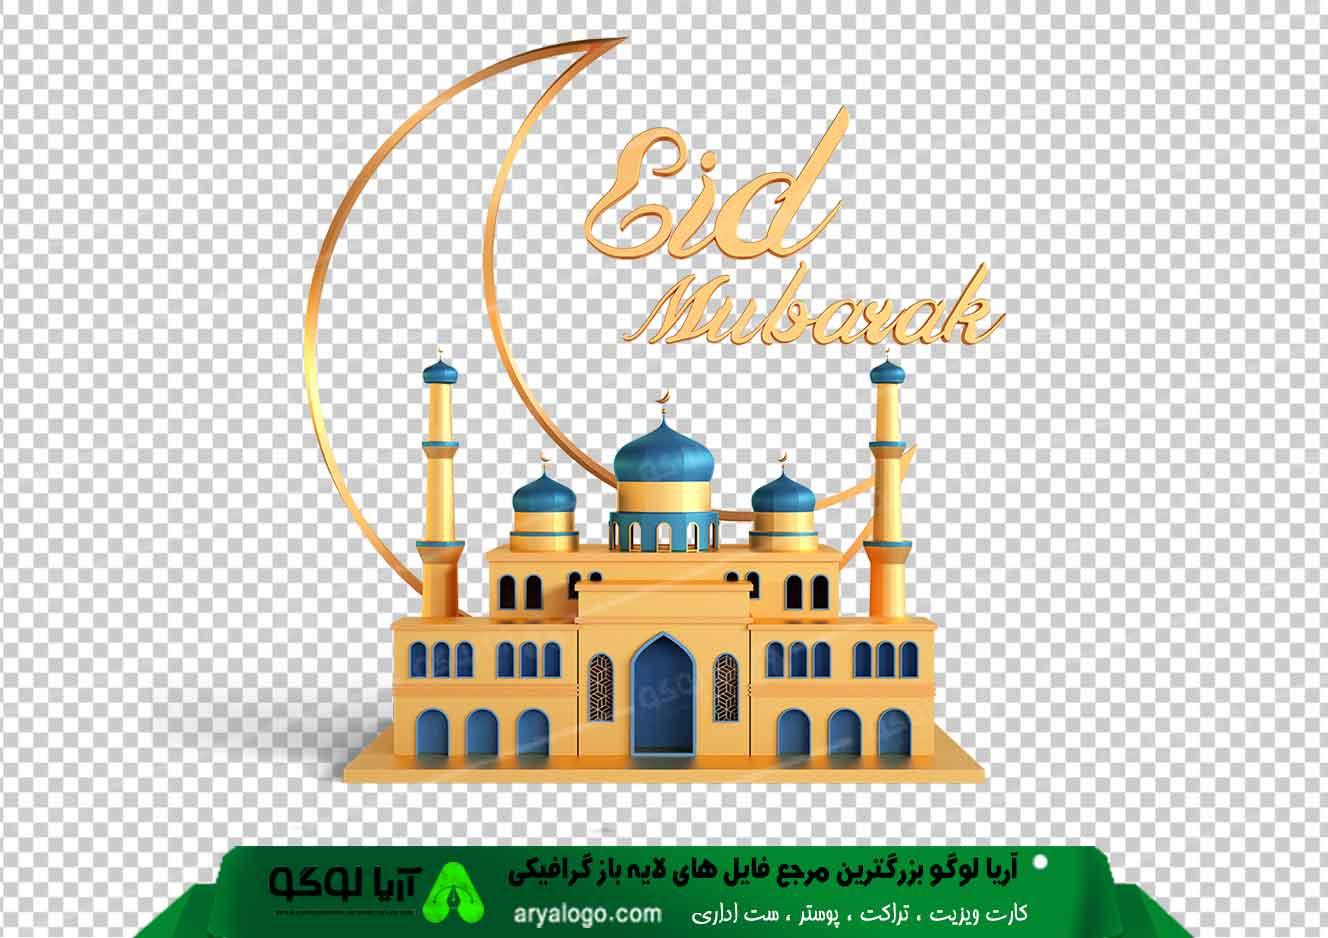 وکتور png ماه رمضان 14